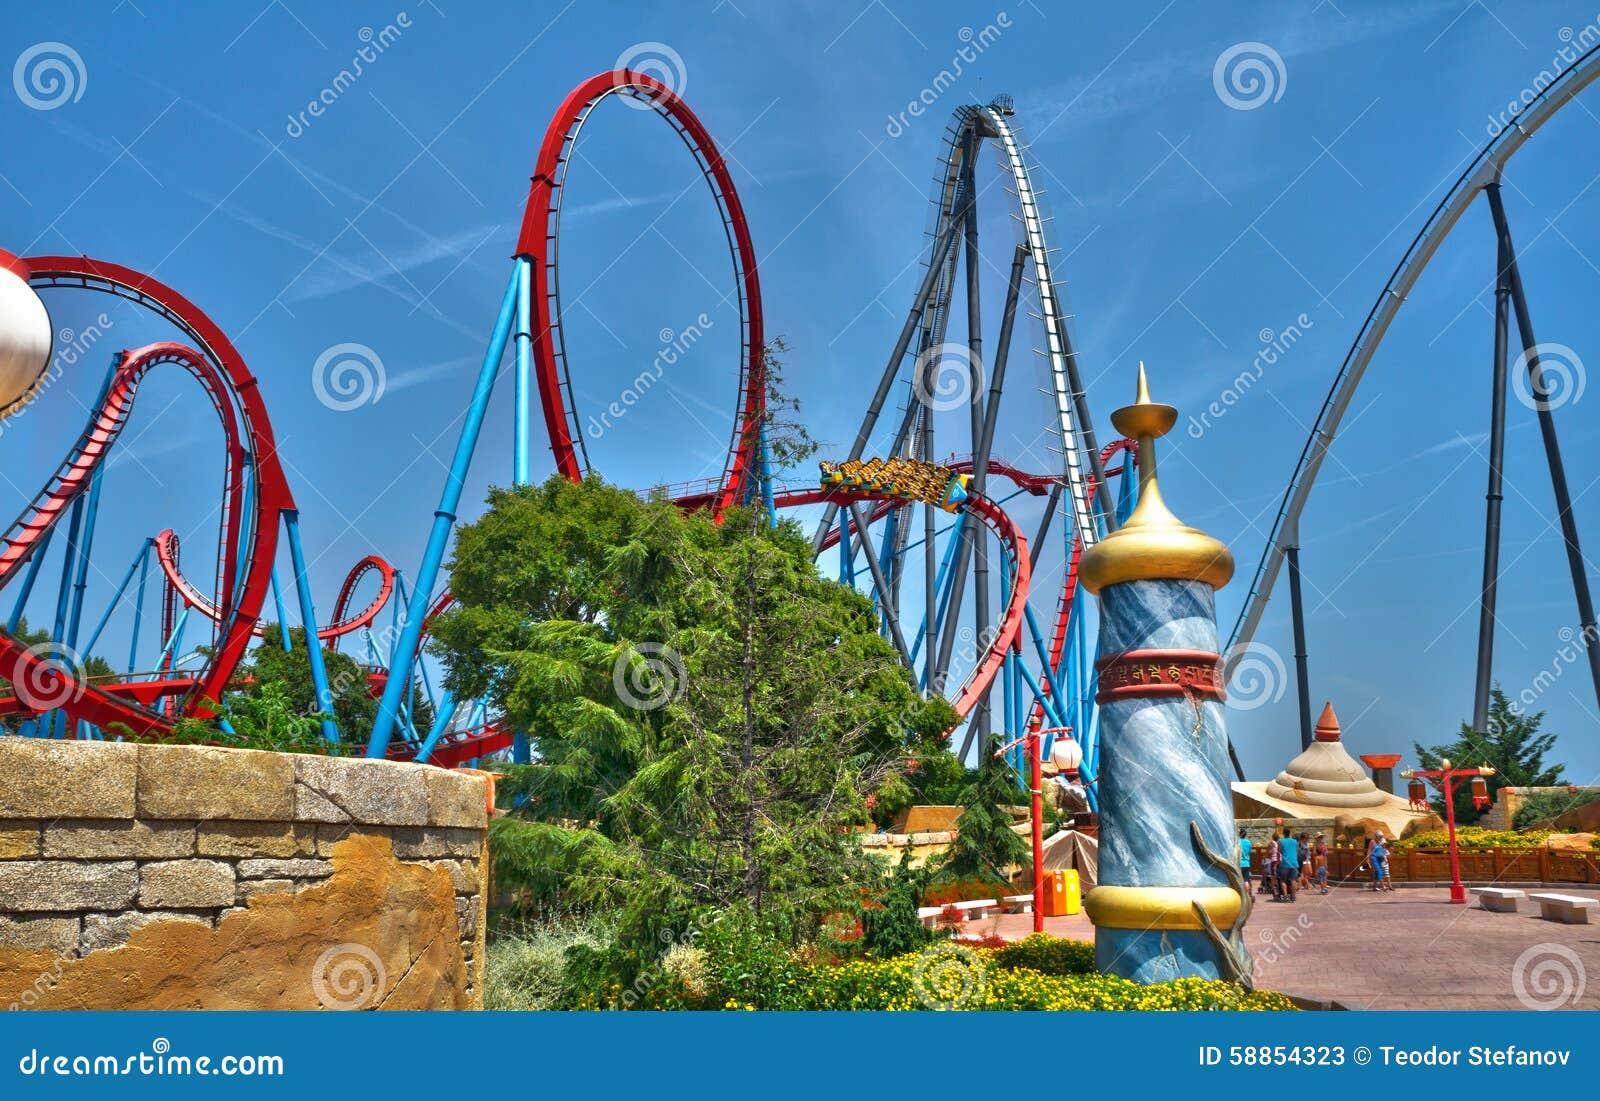 3d roller coaster rides online dating 2